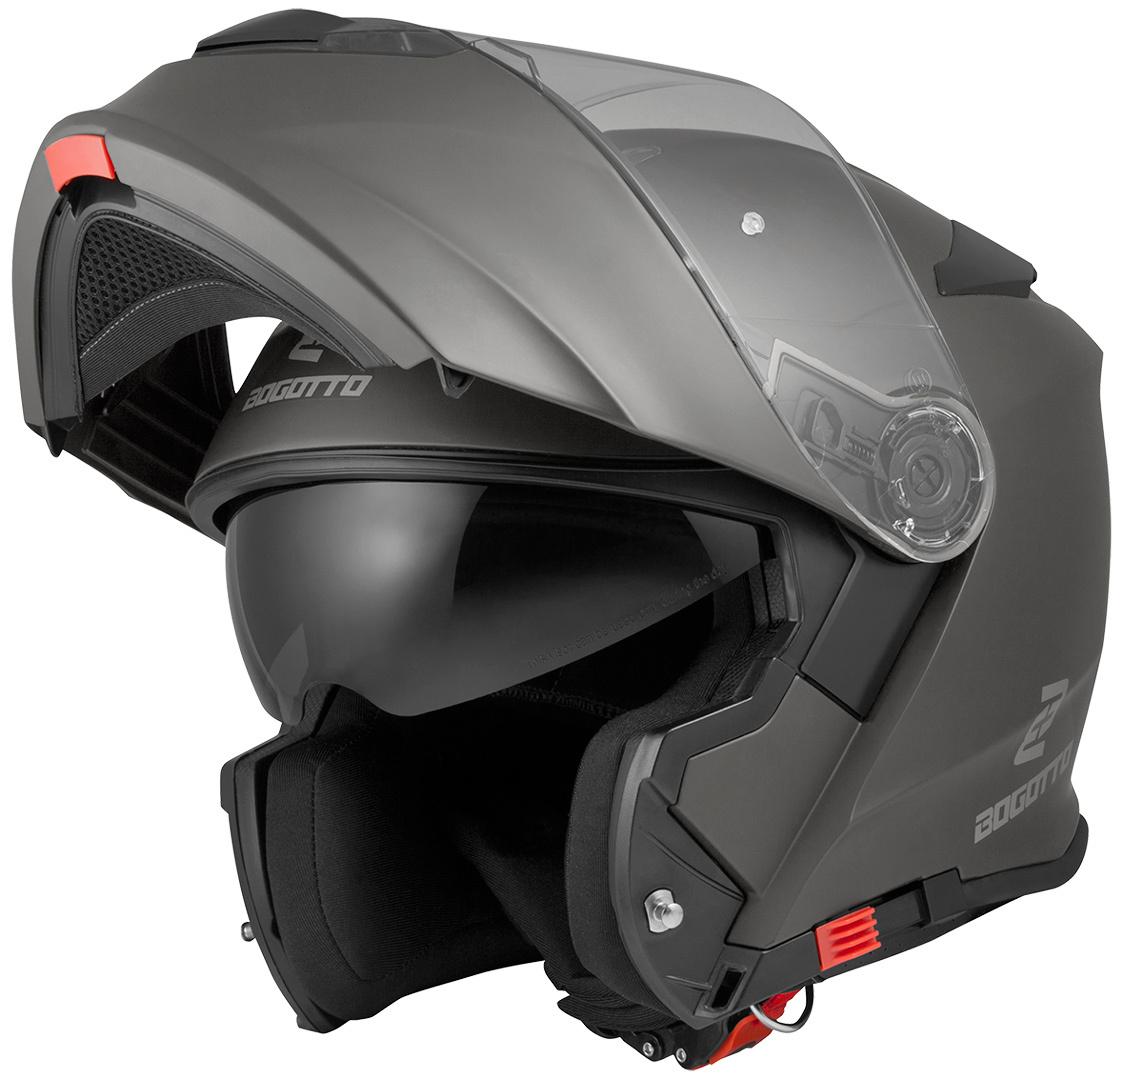 Bogotto V271 Motorrad Klapphelm, schwarz-grau, Größe S, schwarz-grau, Größe S